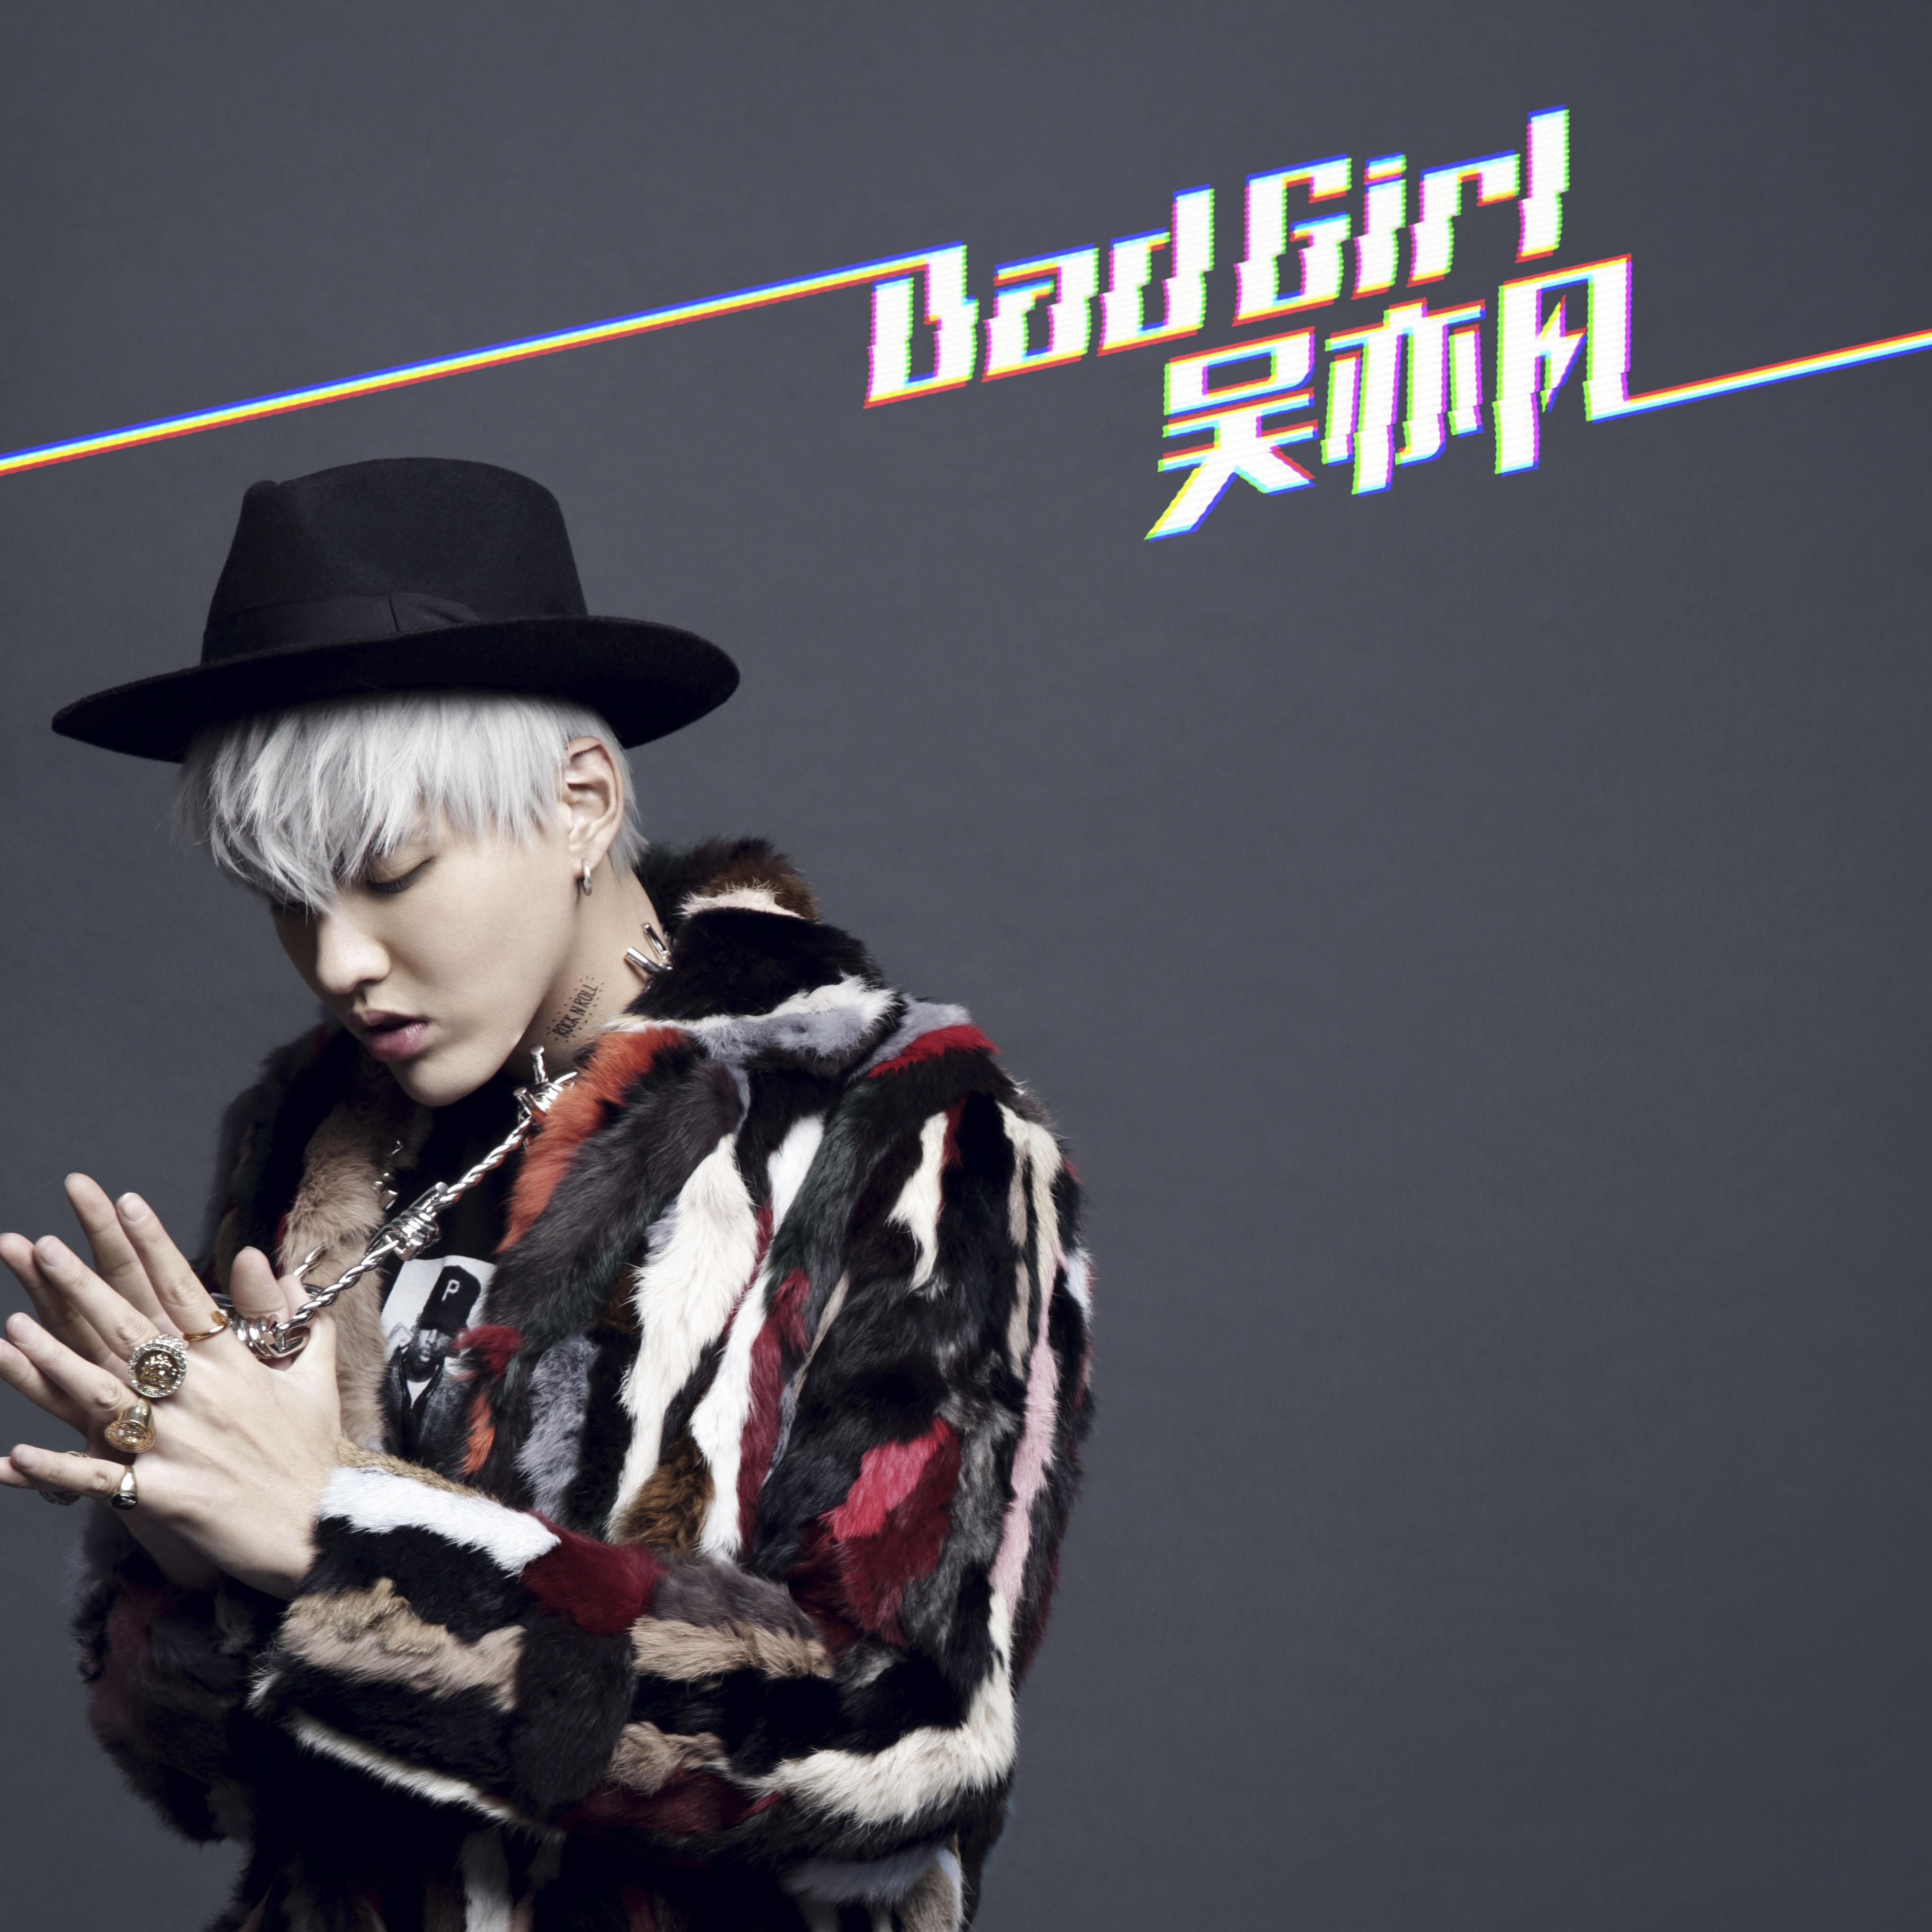 《badgirl》-吴亦凡